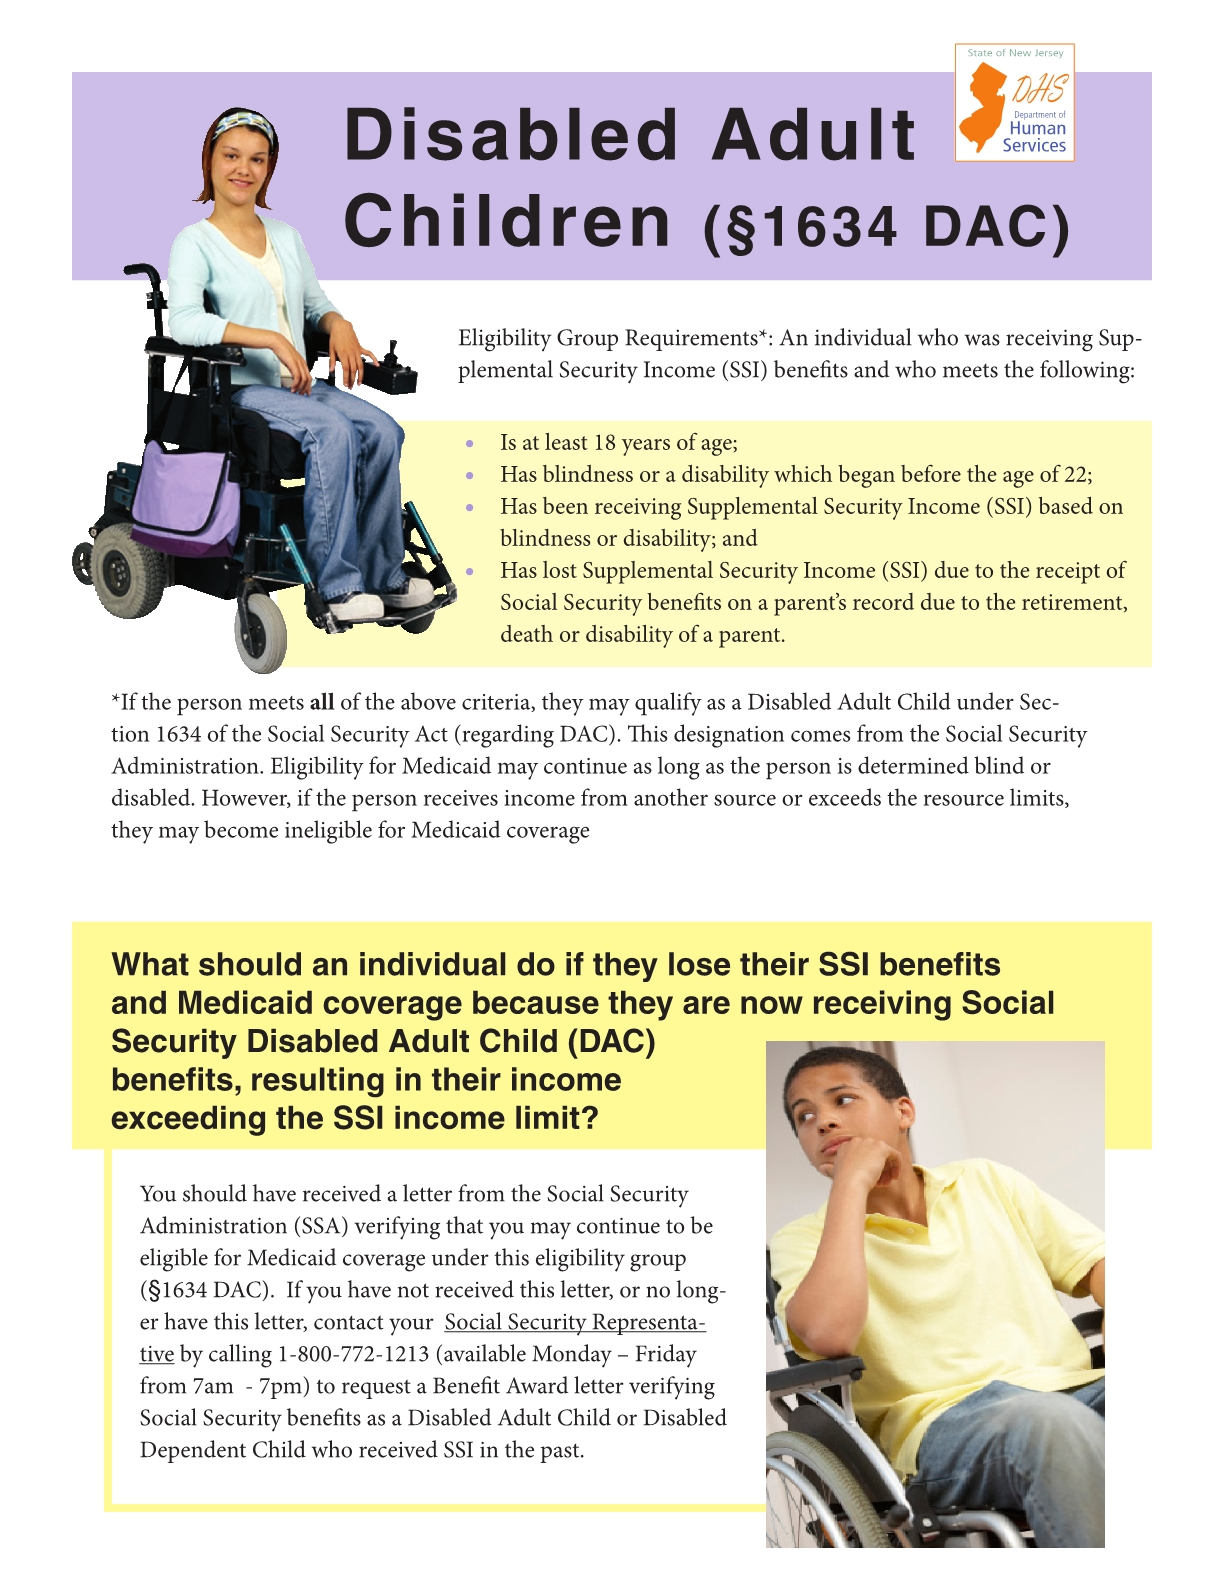 Medicaid 1634 Status: Disabled Adult Children (DAC)